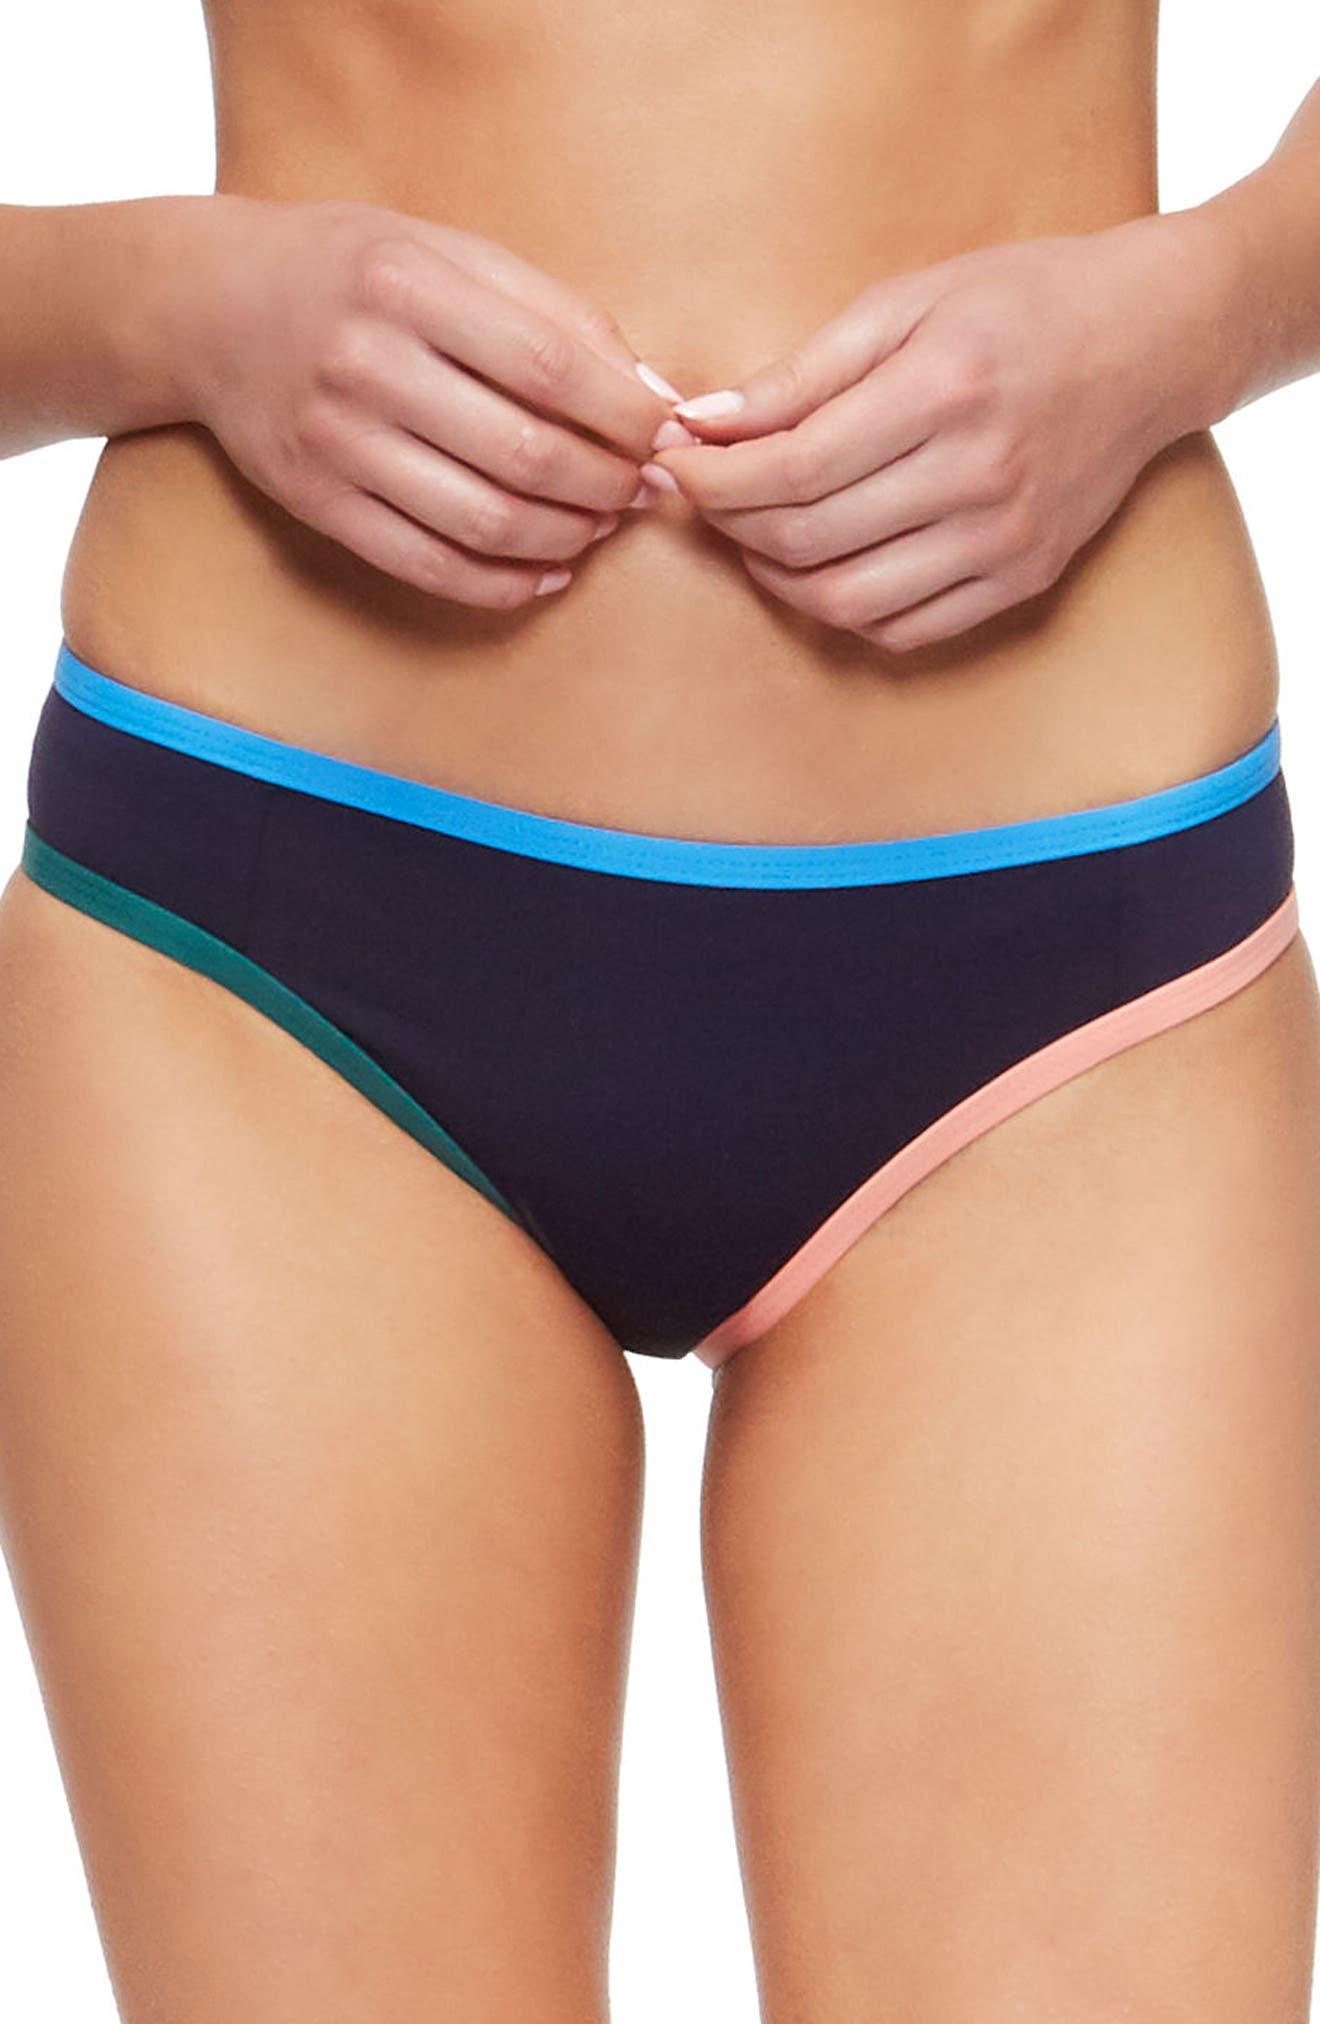 Jayden Bikini Bottoms,                             Main thumbnail 1, color,                             Evening Blue/ French Blue